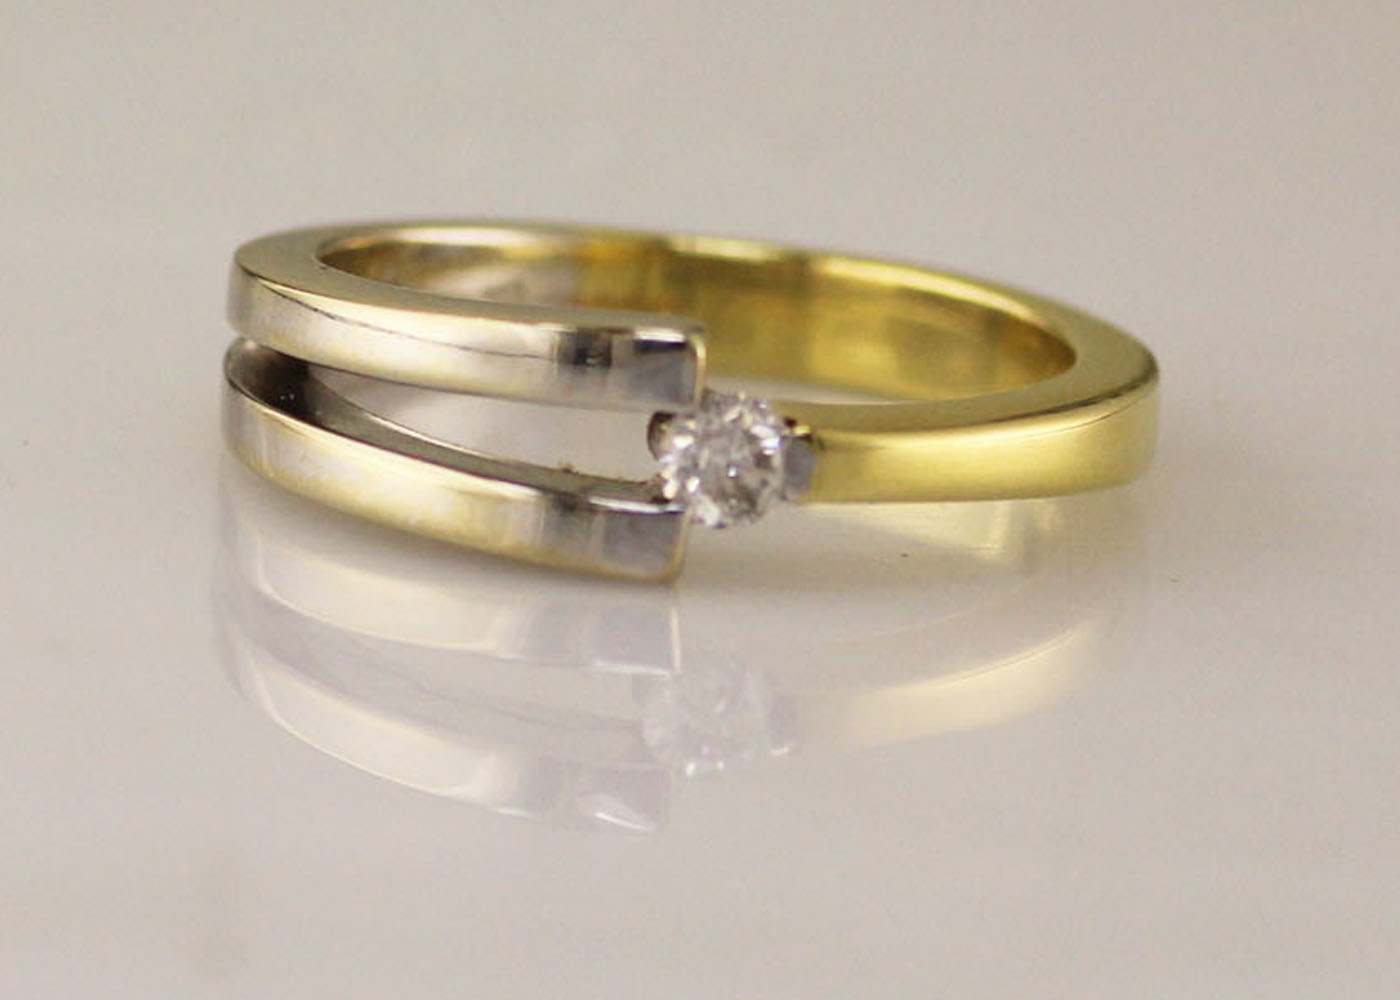 Lot 2 - 18ct Two Tone Diamond Set Ring 0.13 Carats